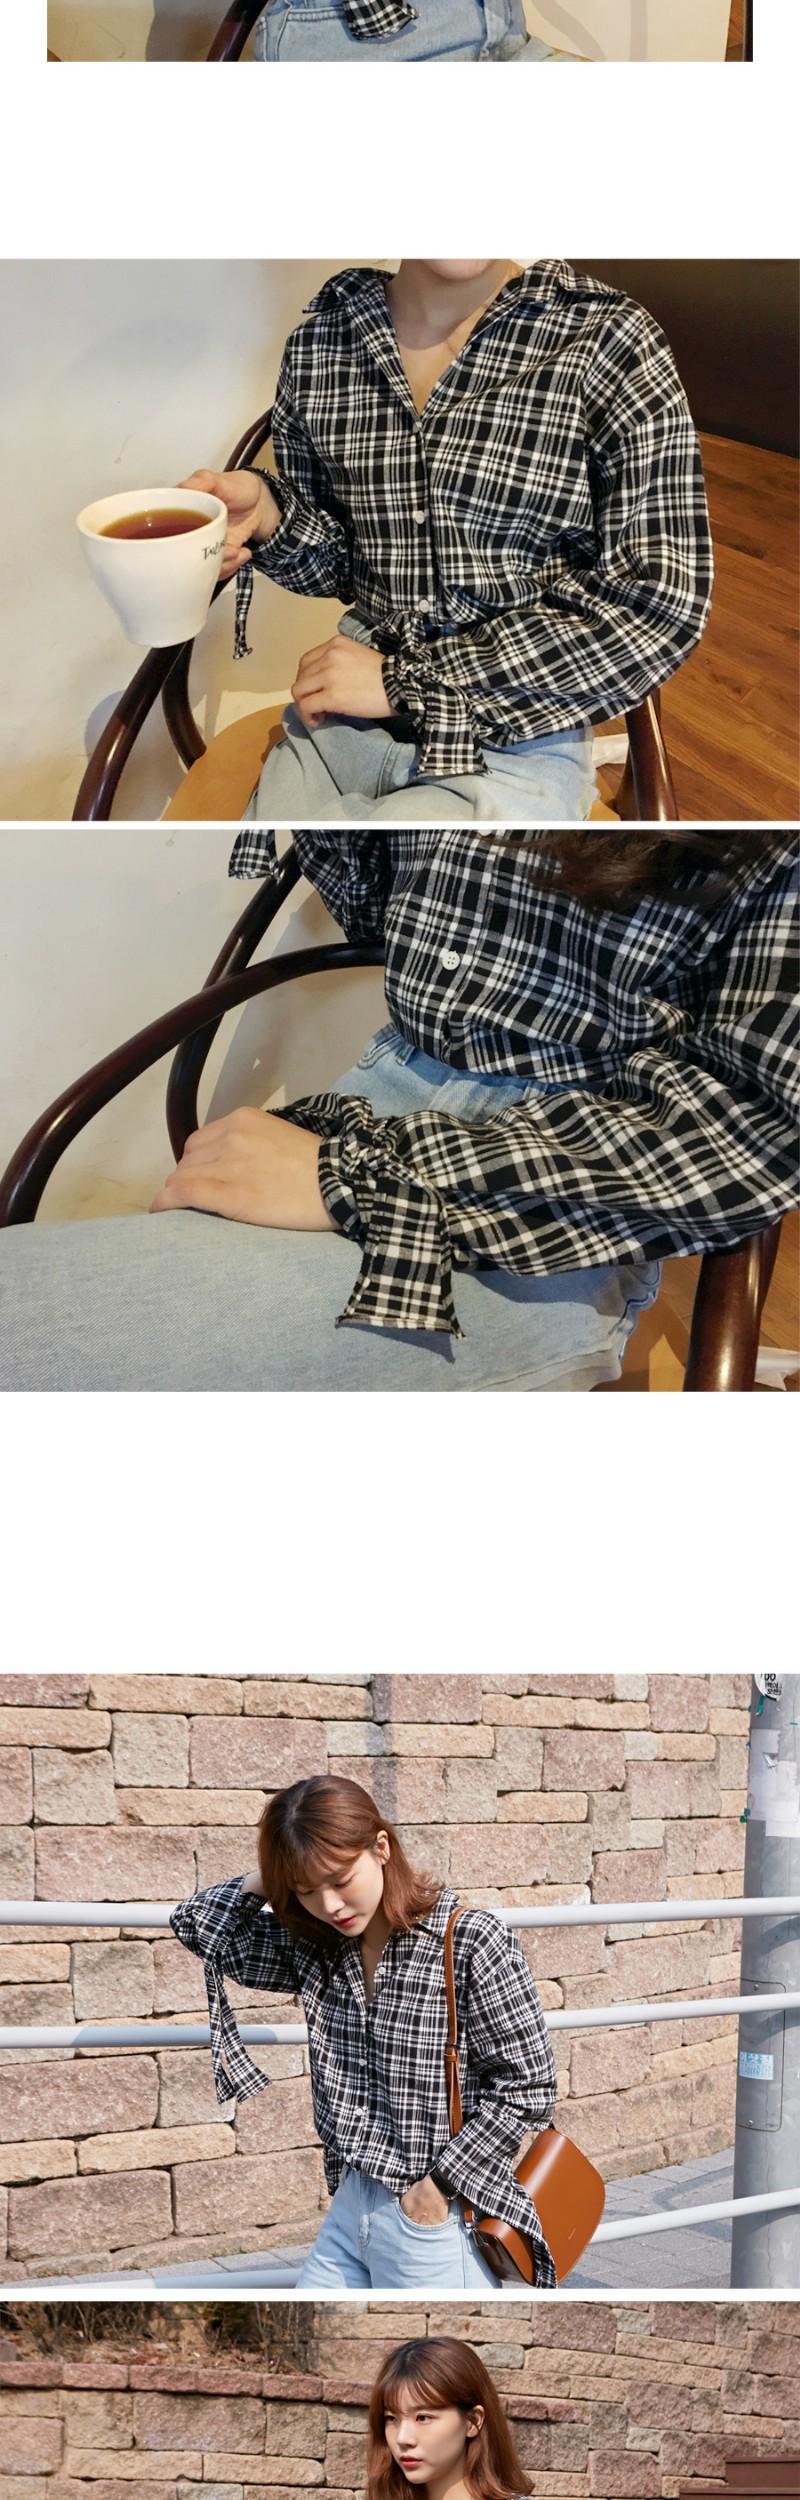 Bean check cuffs shirts_H (size : free)